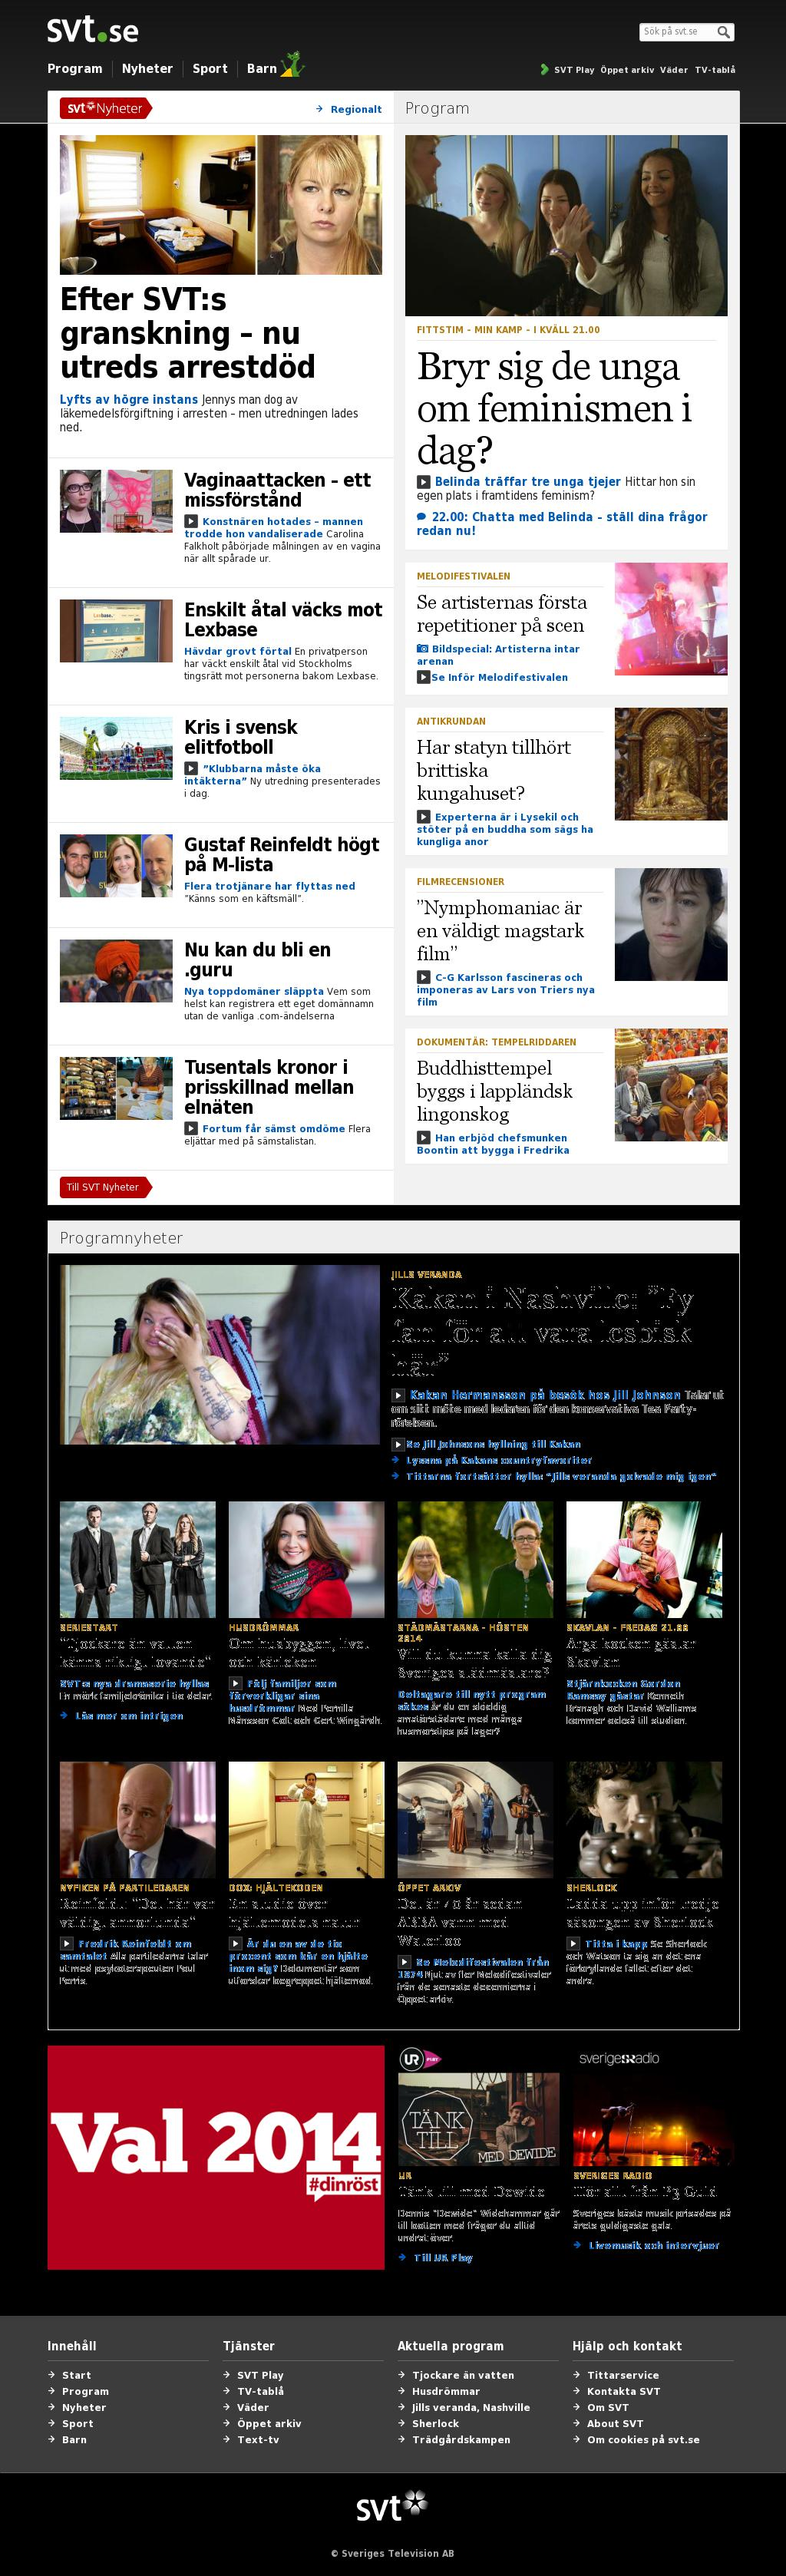 SVT at Thursday Jan. 30, 2014, 7:21 p.m. UTC